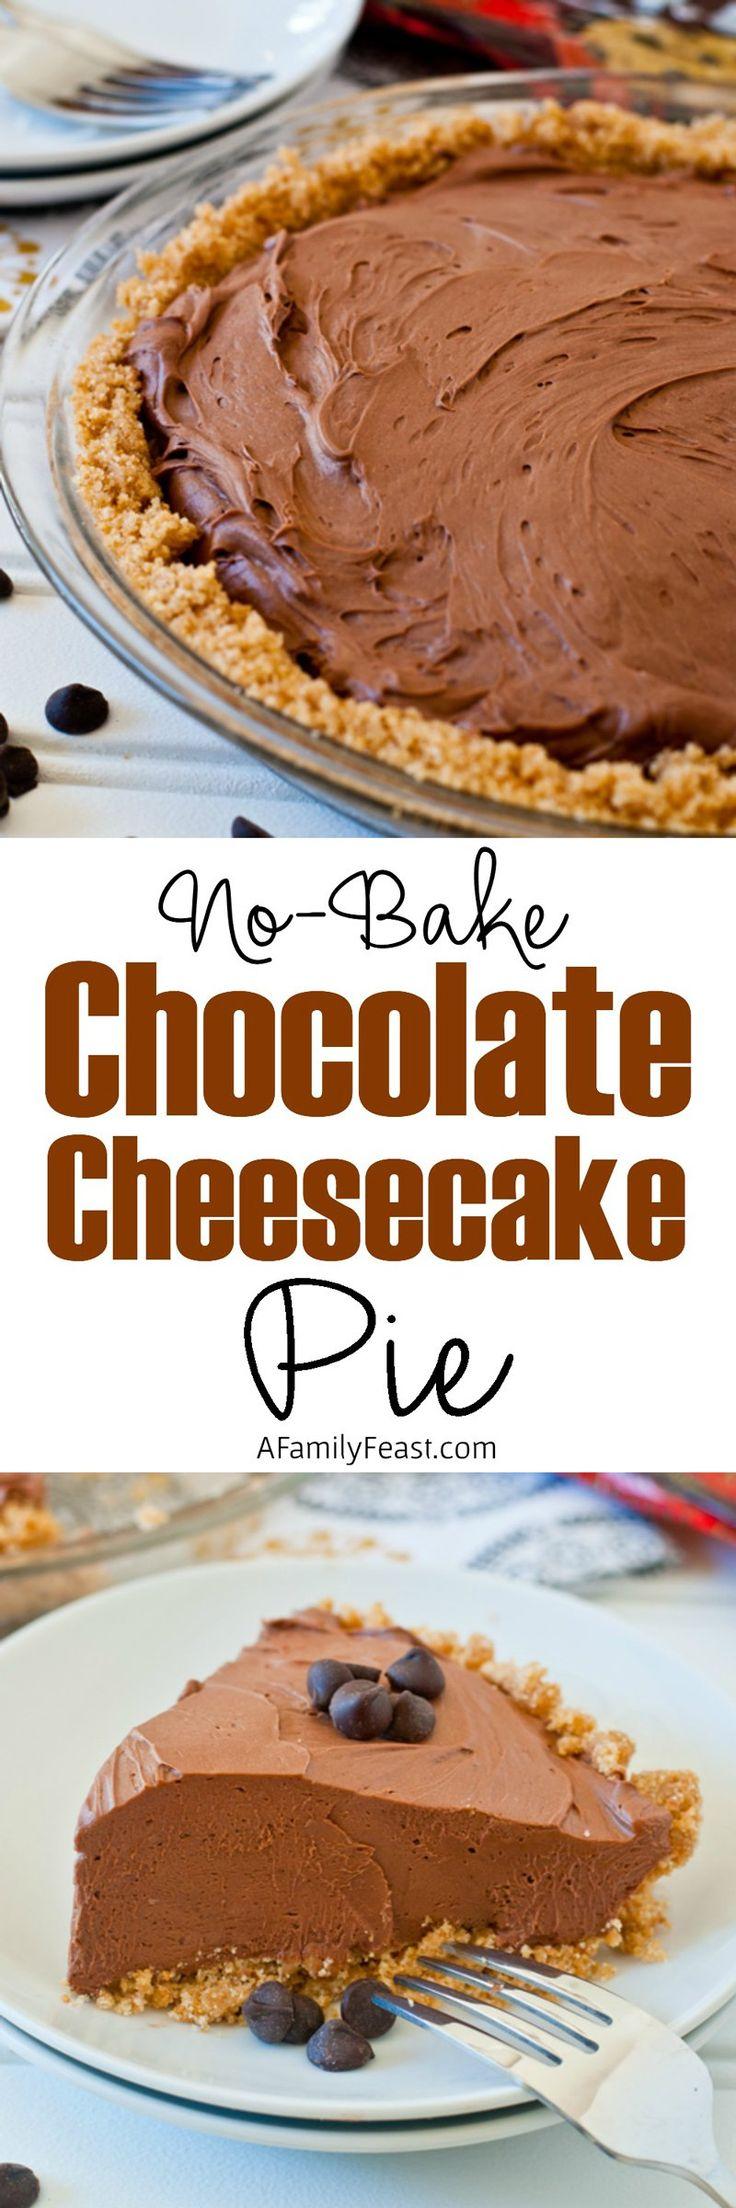 No-Bake Chocolate Cheesecake Pie - An easy chocolate pie #chocolate #nobake #pie